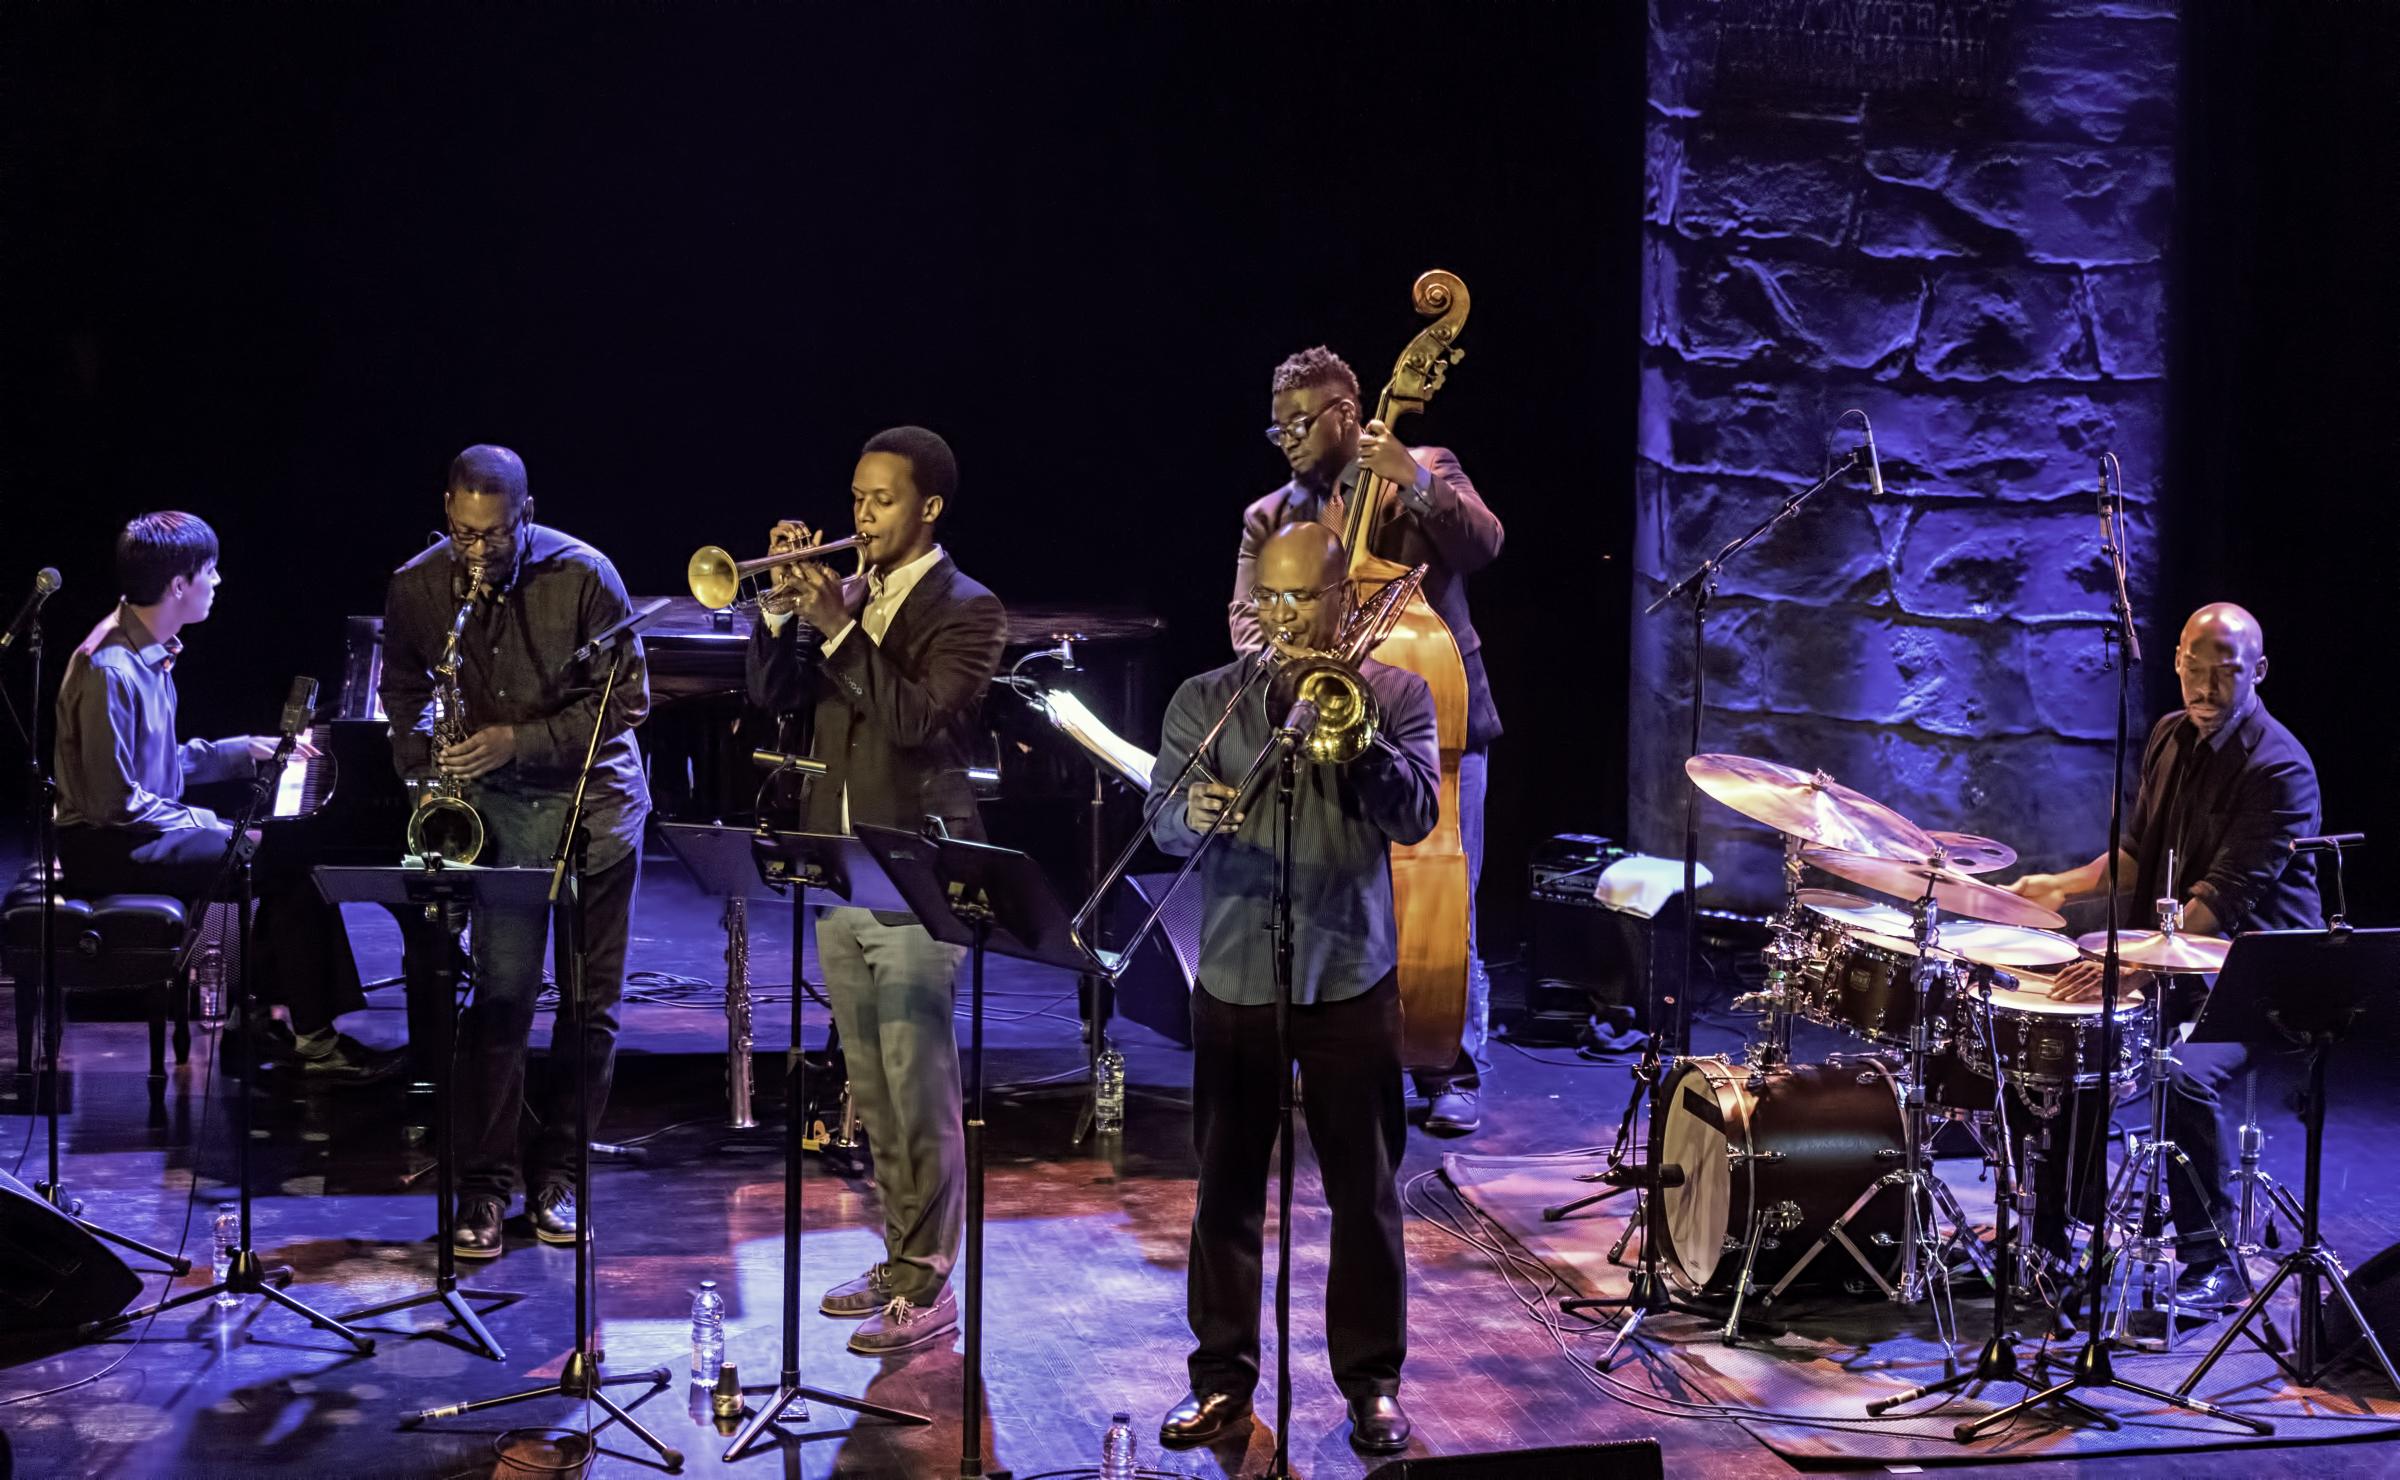 Glenn Zaleski, Ravi Coltrane, Jason Palmer, Dezron Douglas, Robin Eubanks and E.J. Strickland with Ravi Coltrane and the Void at The Montreal International Jazz Festival 2017